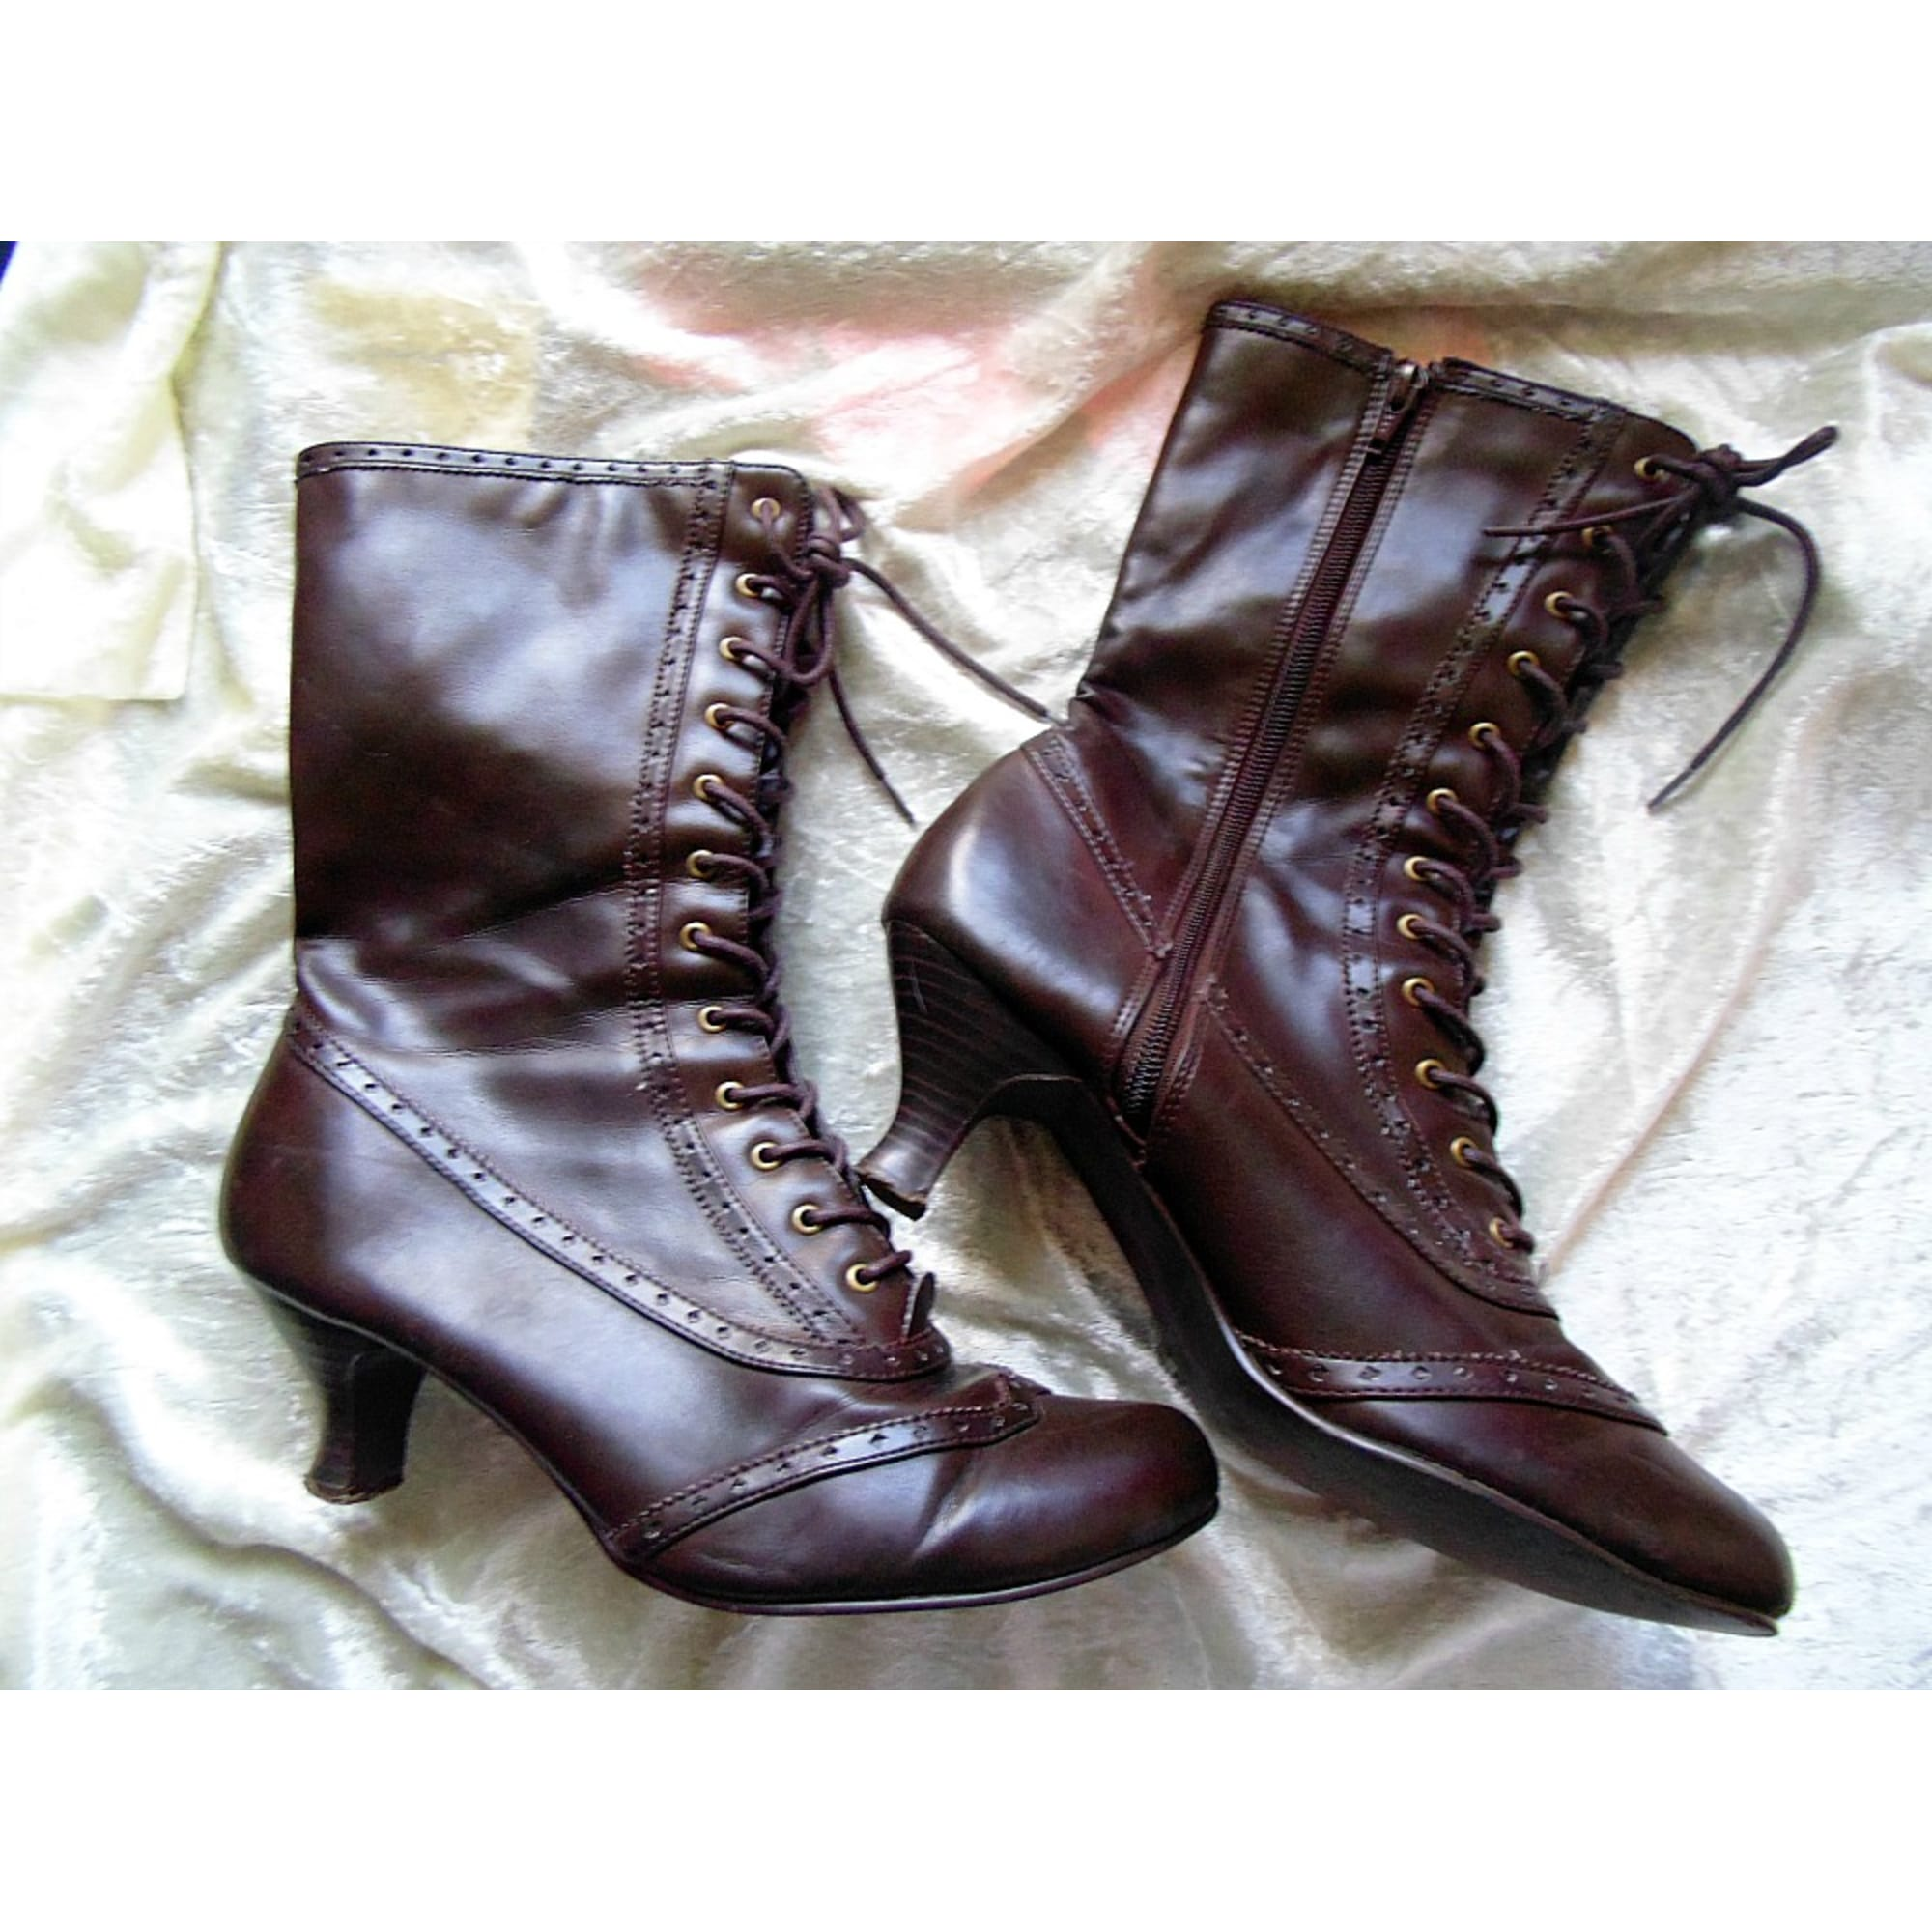 Bottinesamp; À Low À Low Talons Bottinesamp; Boots Boots À Talons Bottinesamp; Boots Low qMVSUzpG